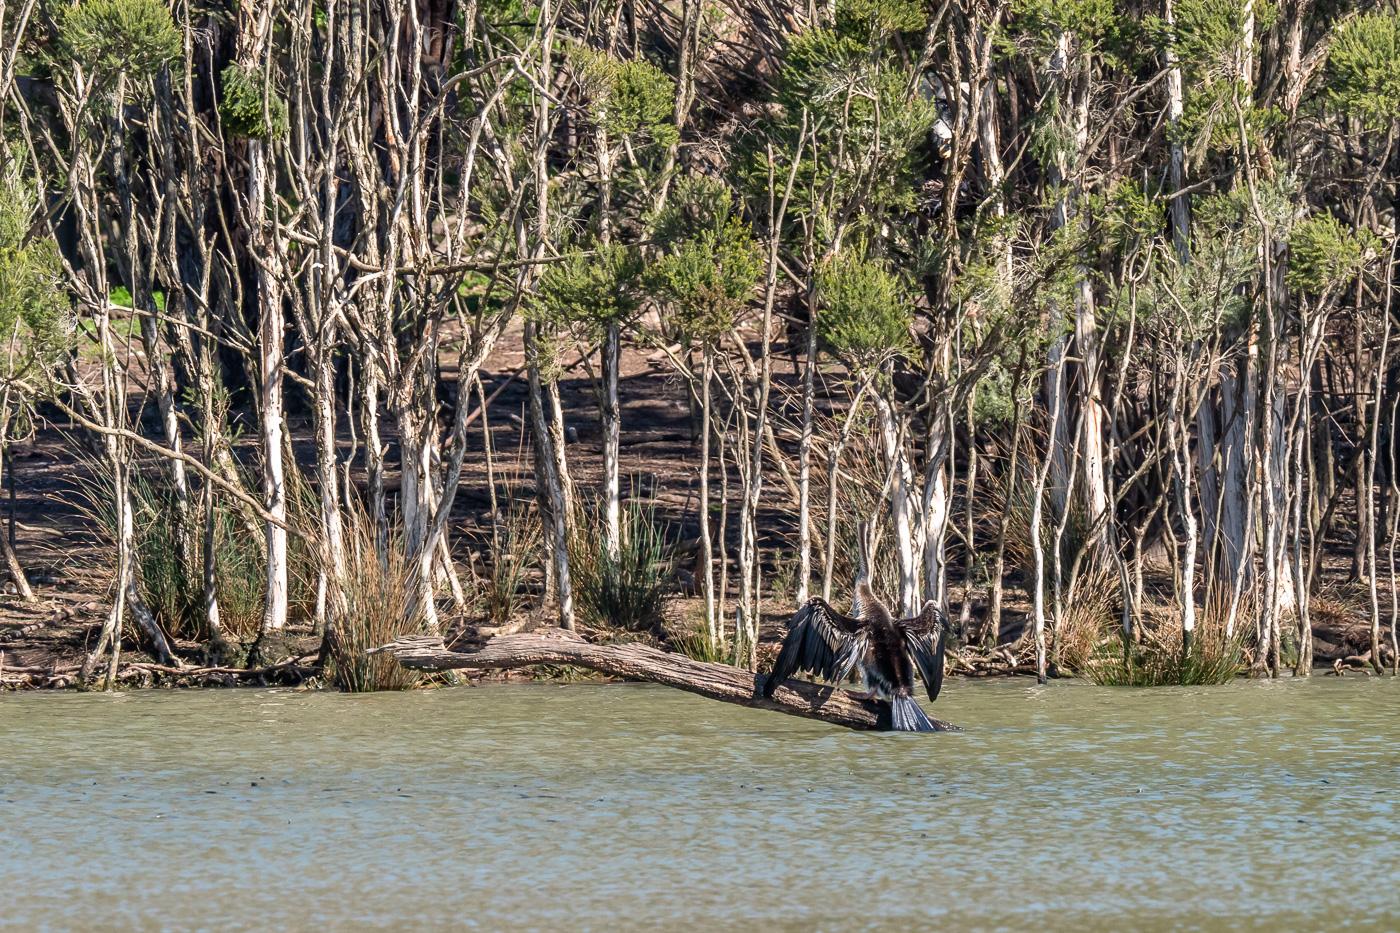 Australasian Darter - B Hood